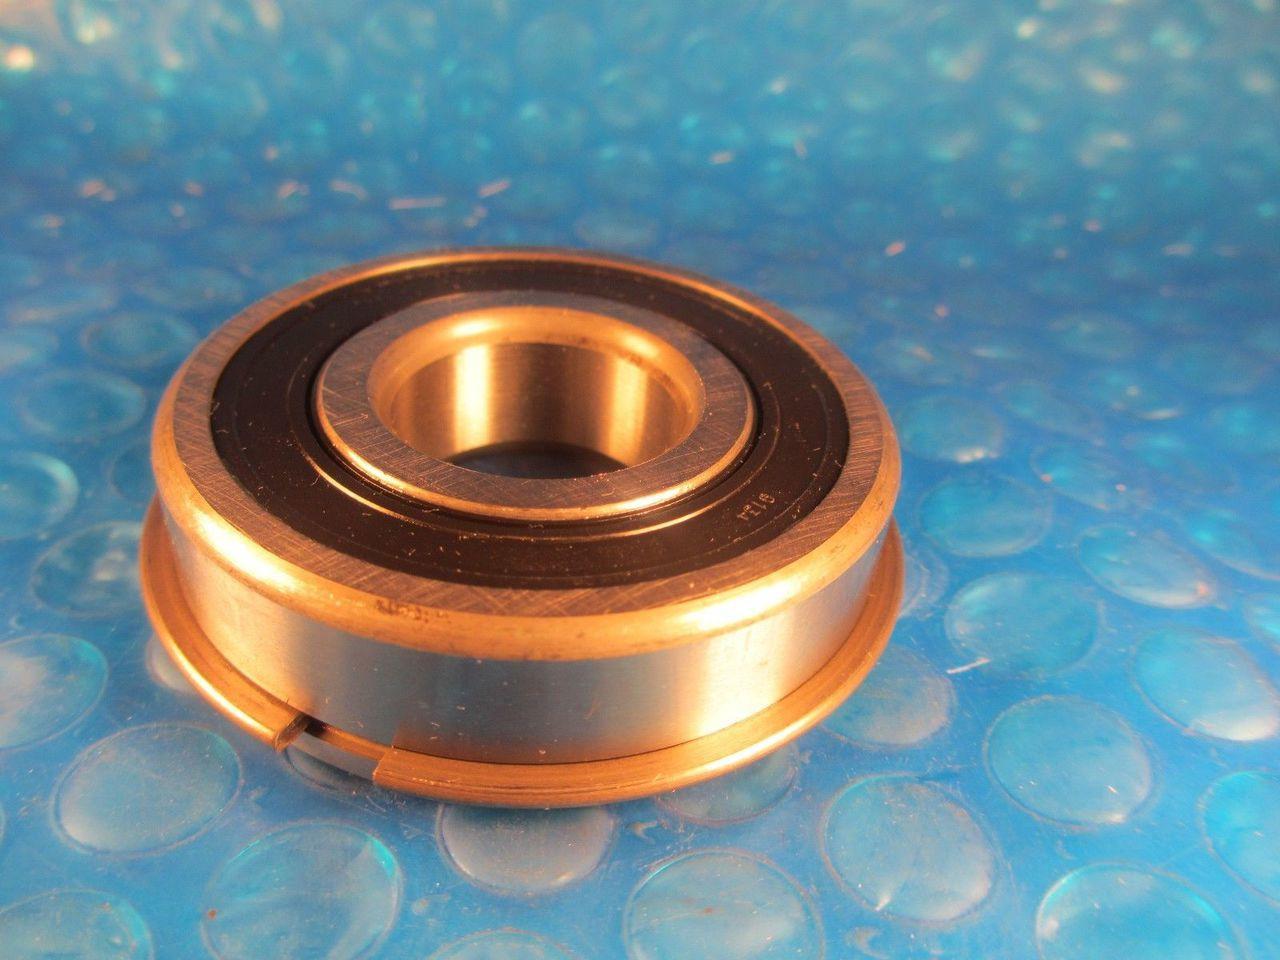 New  206KLL2 Bearing 30 x 62 x 24 Retaining Ring Type 206 KLL 2